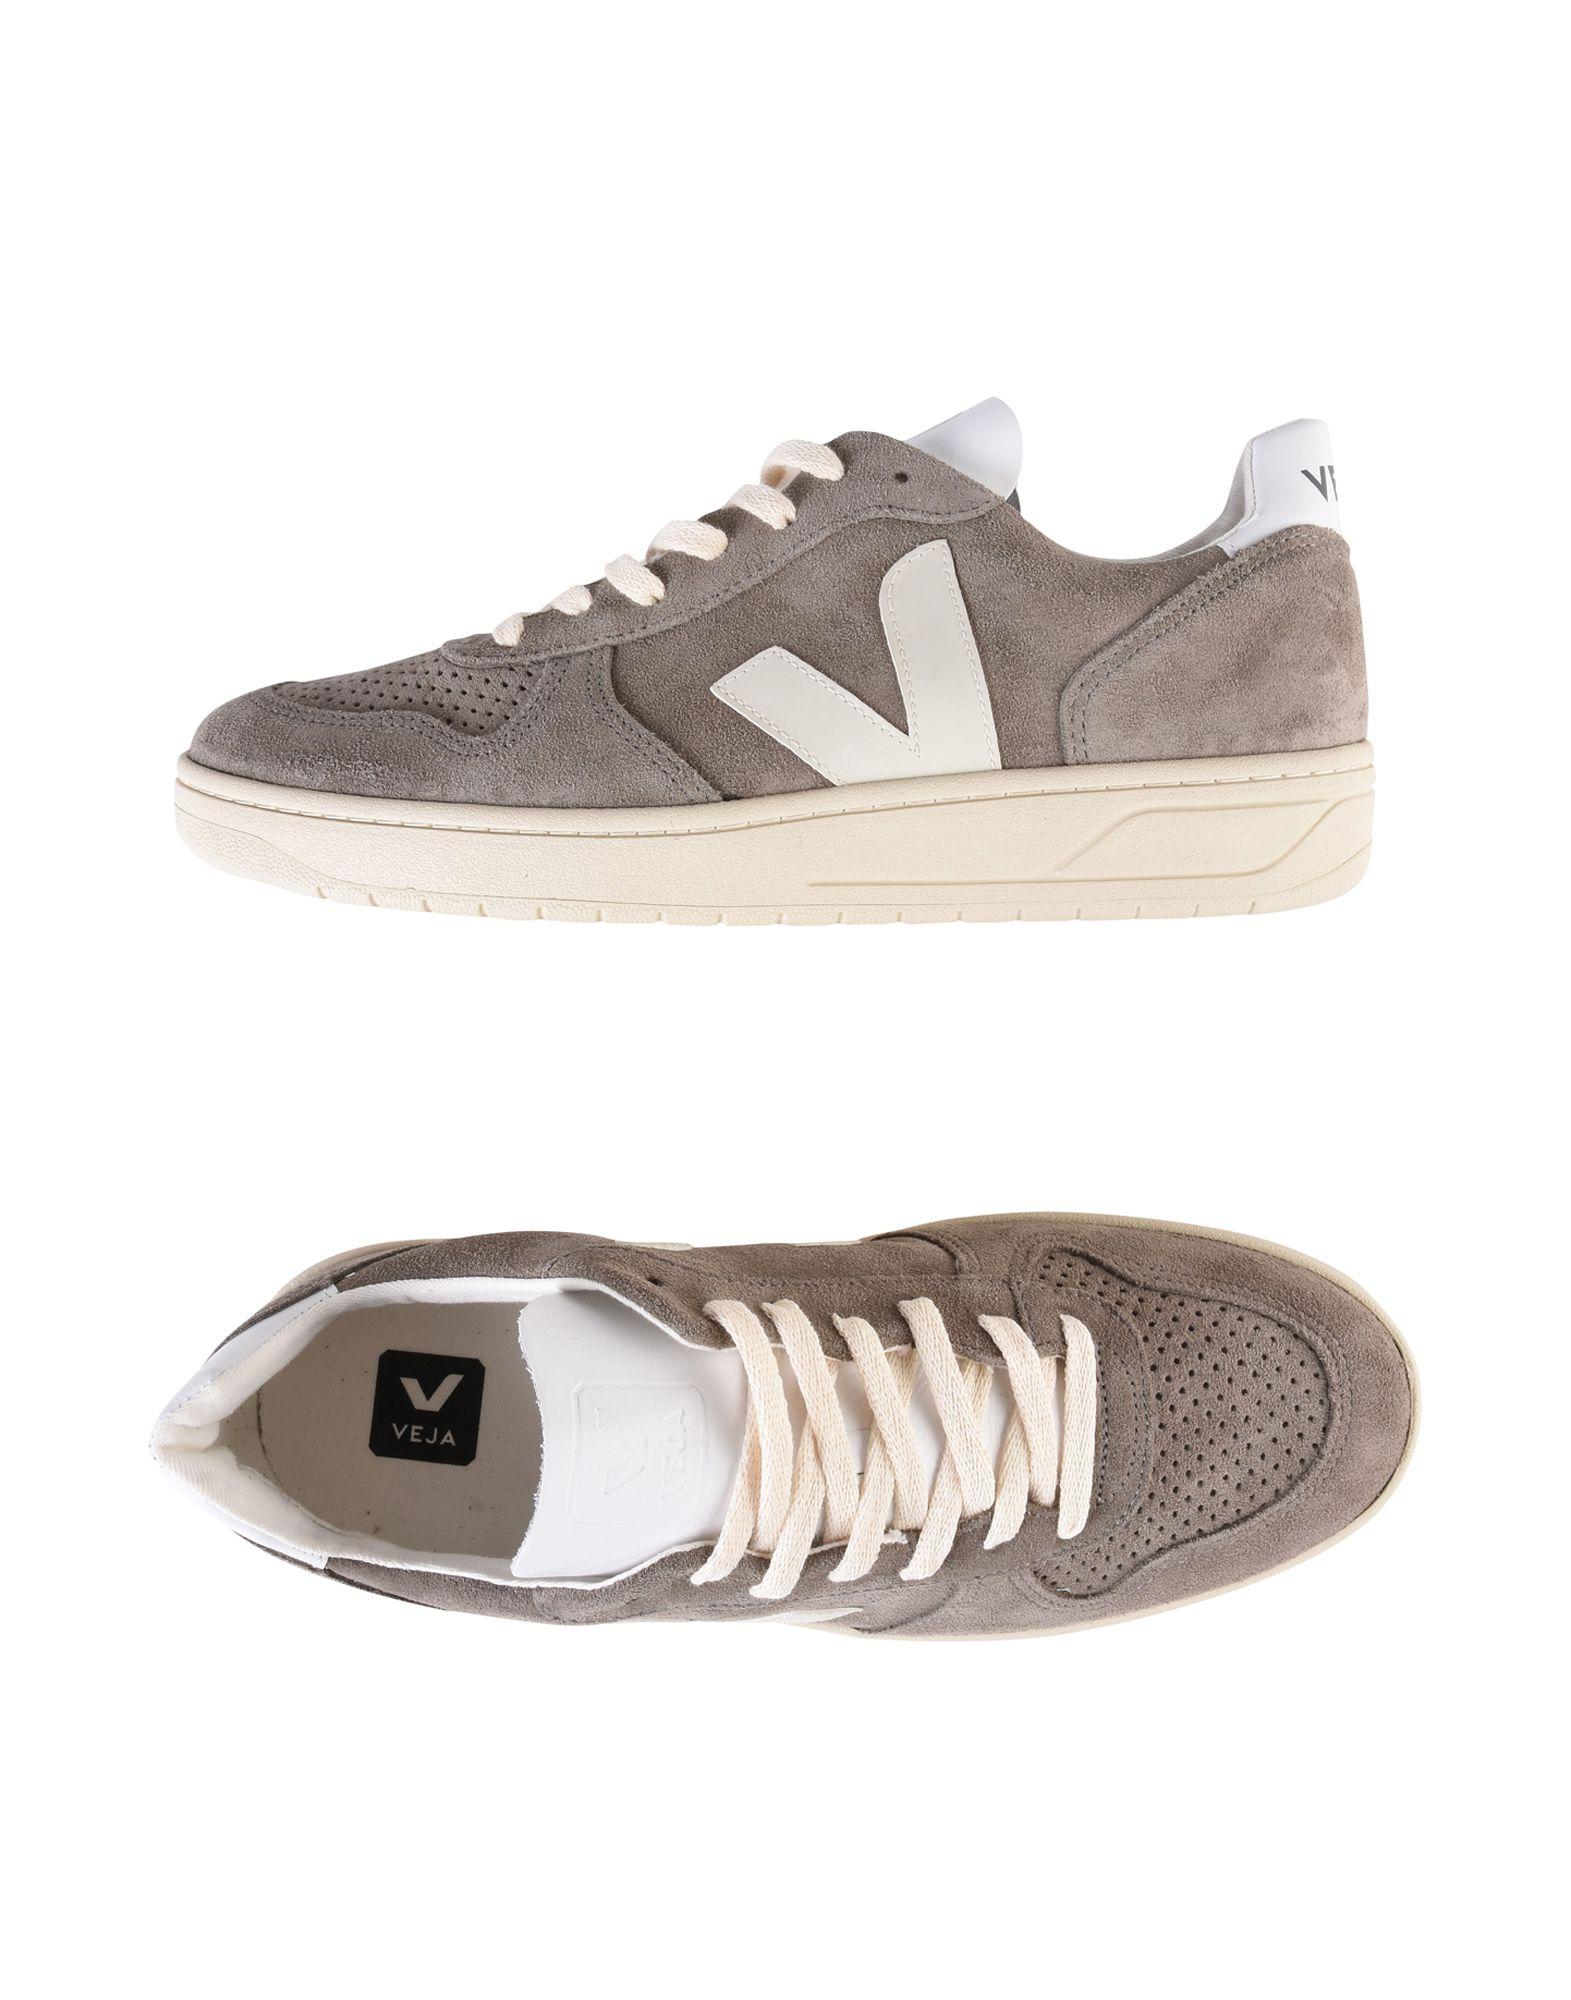 Veja Schuhe Sneakers Herren  11306268MR Gute Qualität beliebte Schuhe Veja 3ad068